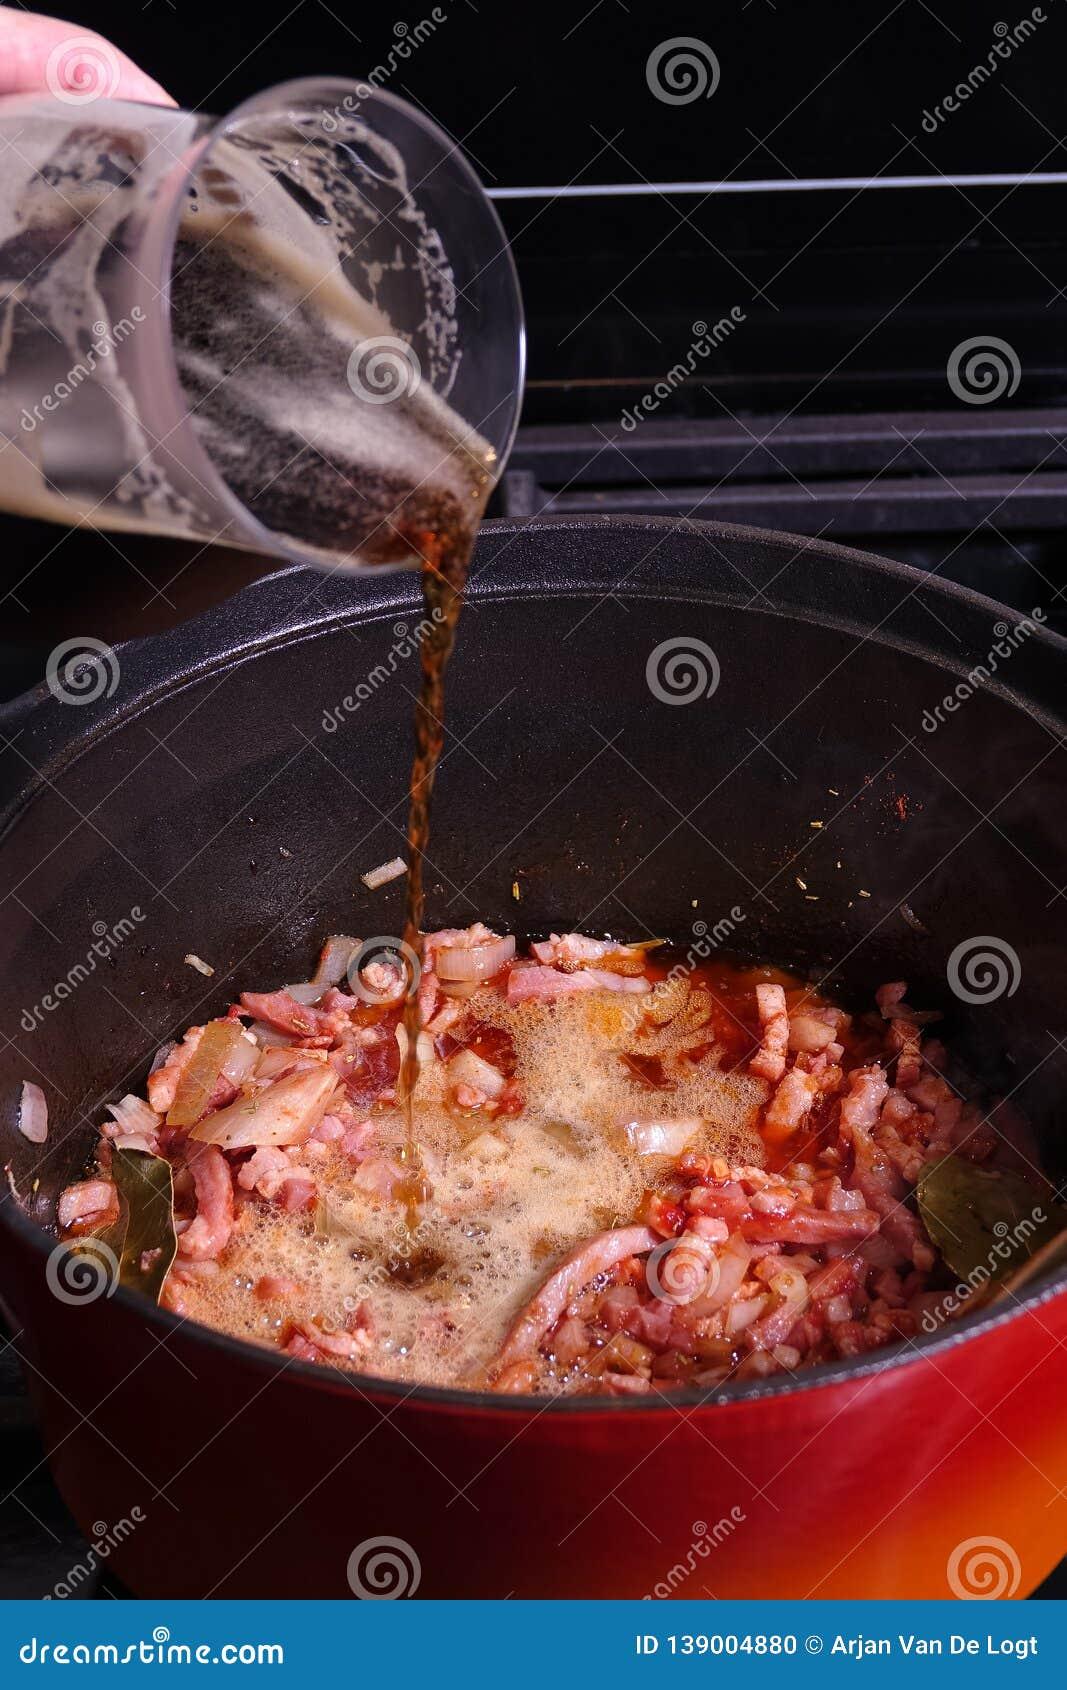 Goulash or beef stew cooking. Beer is being added